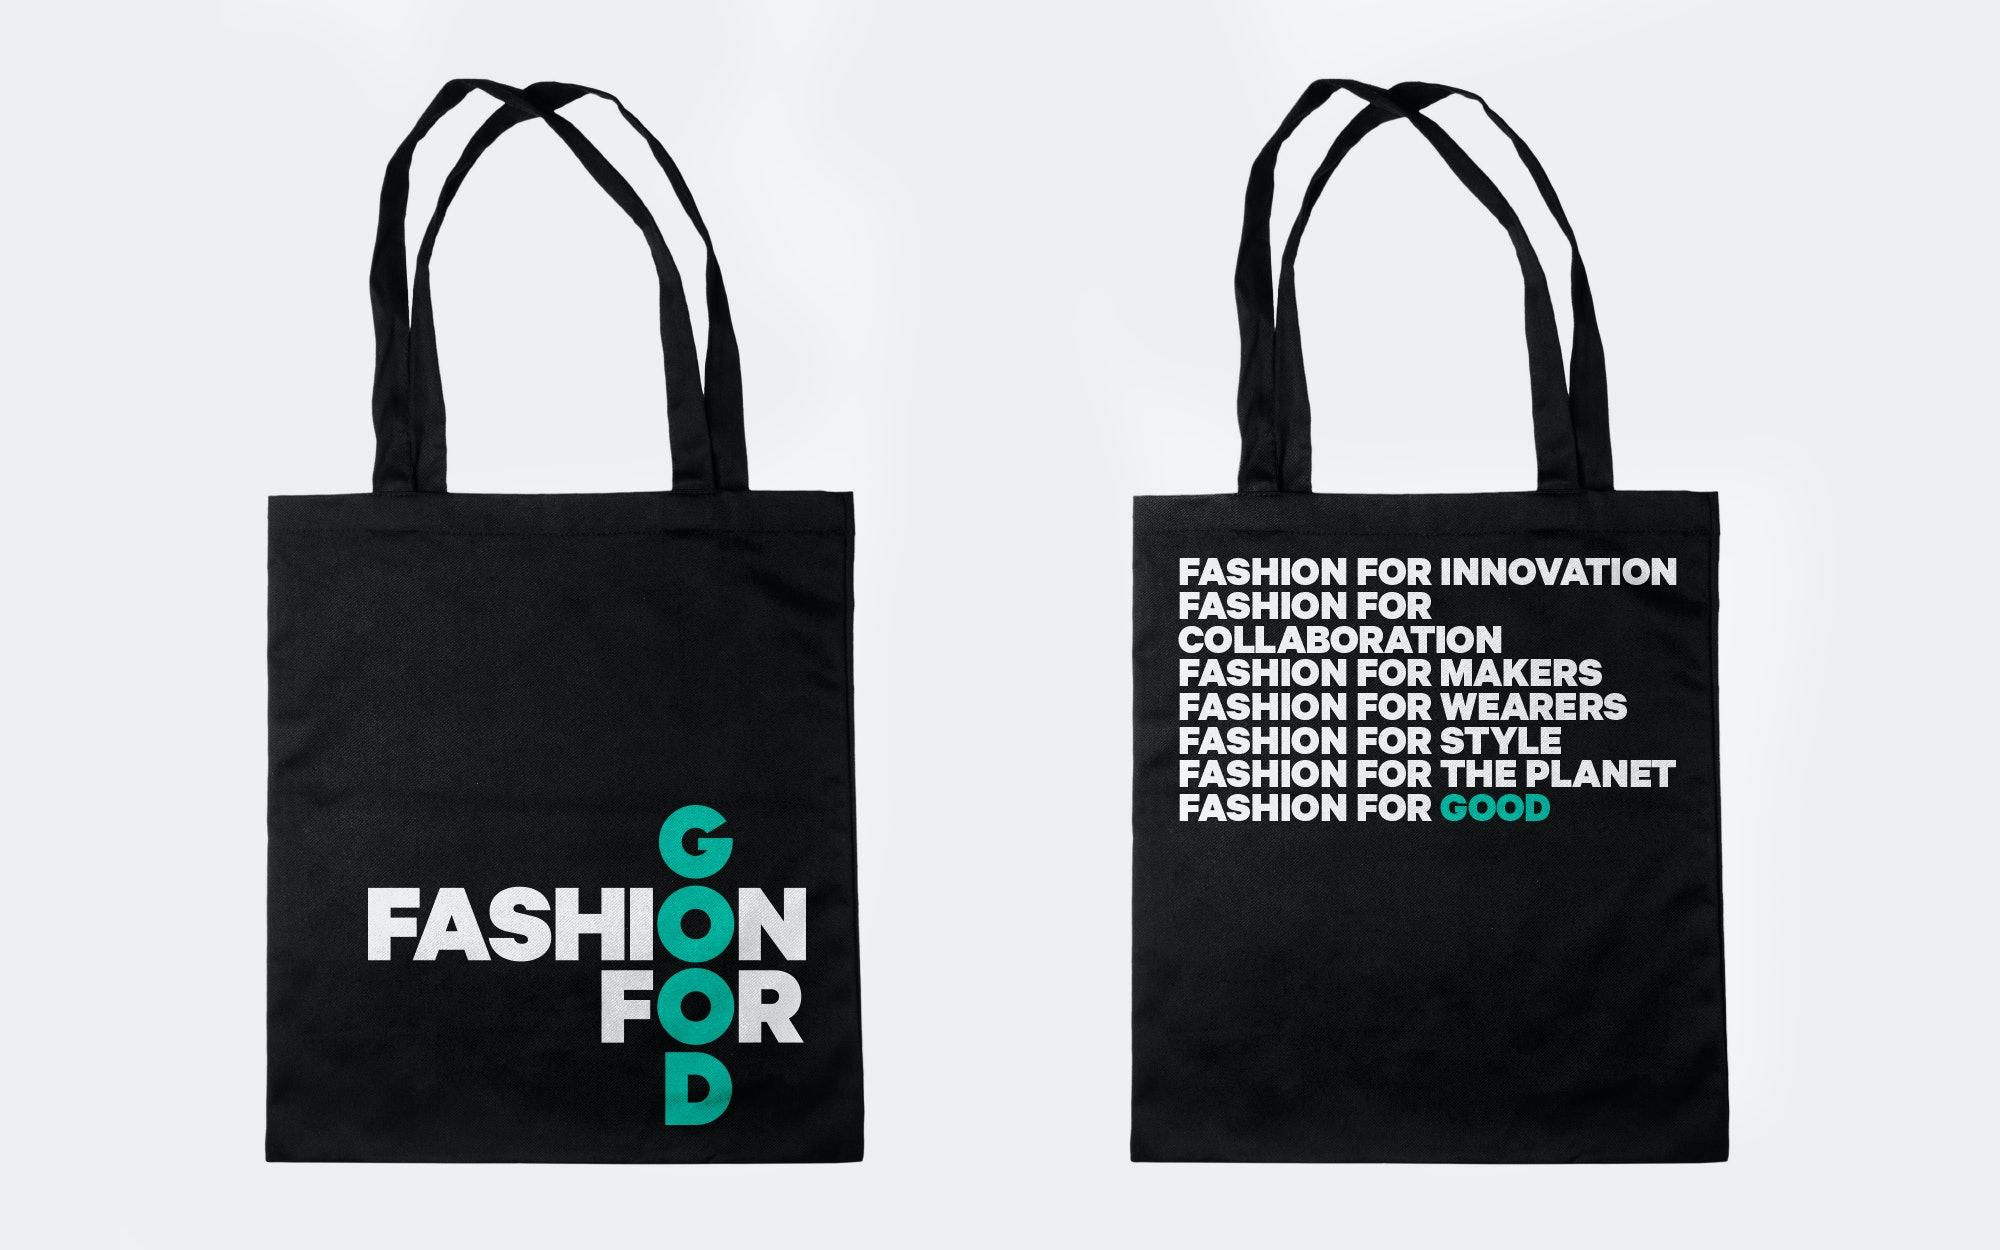 Fashion For Good photo